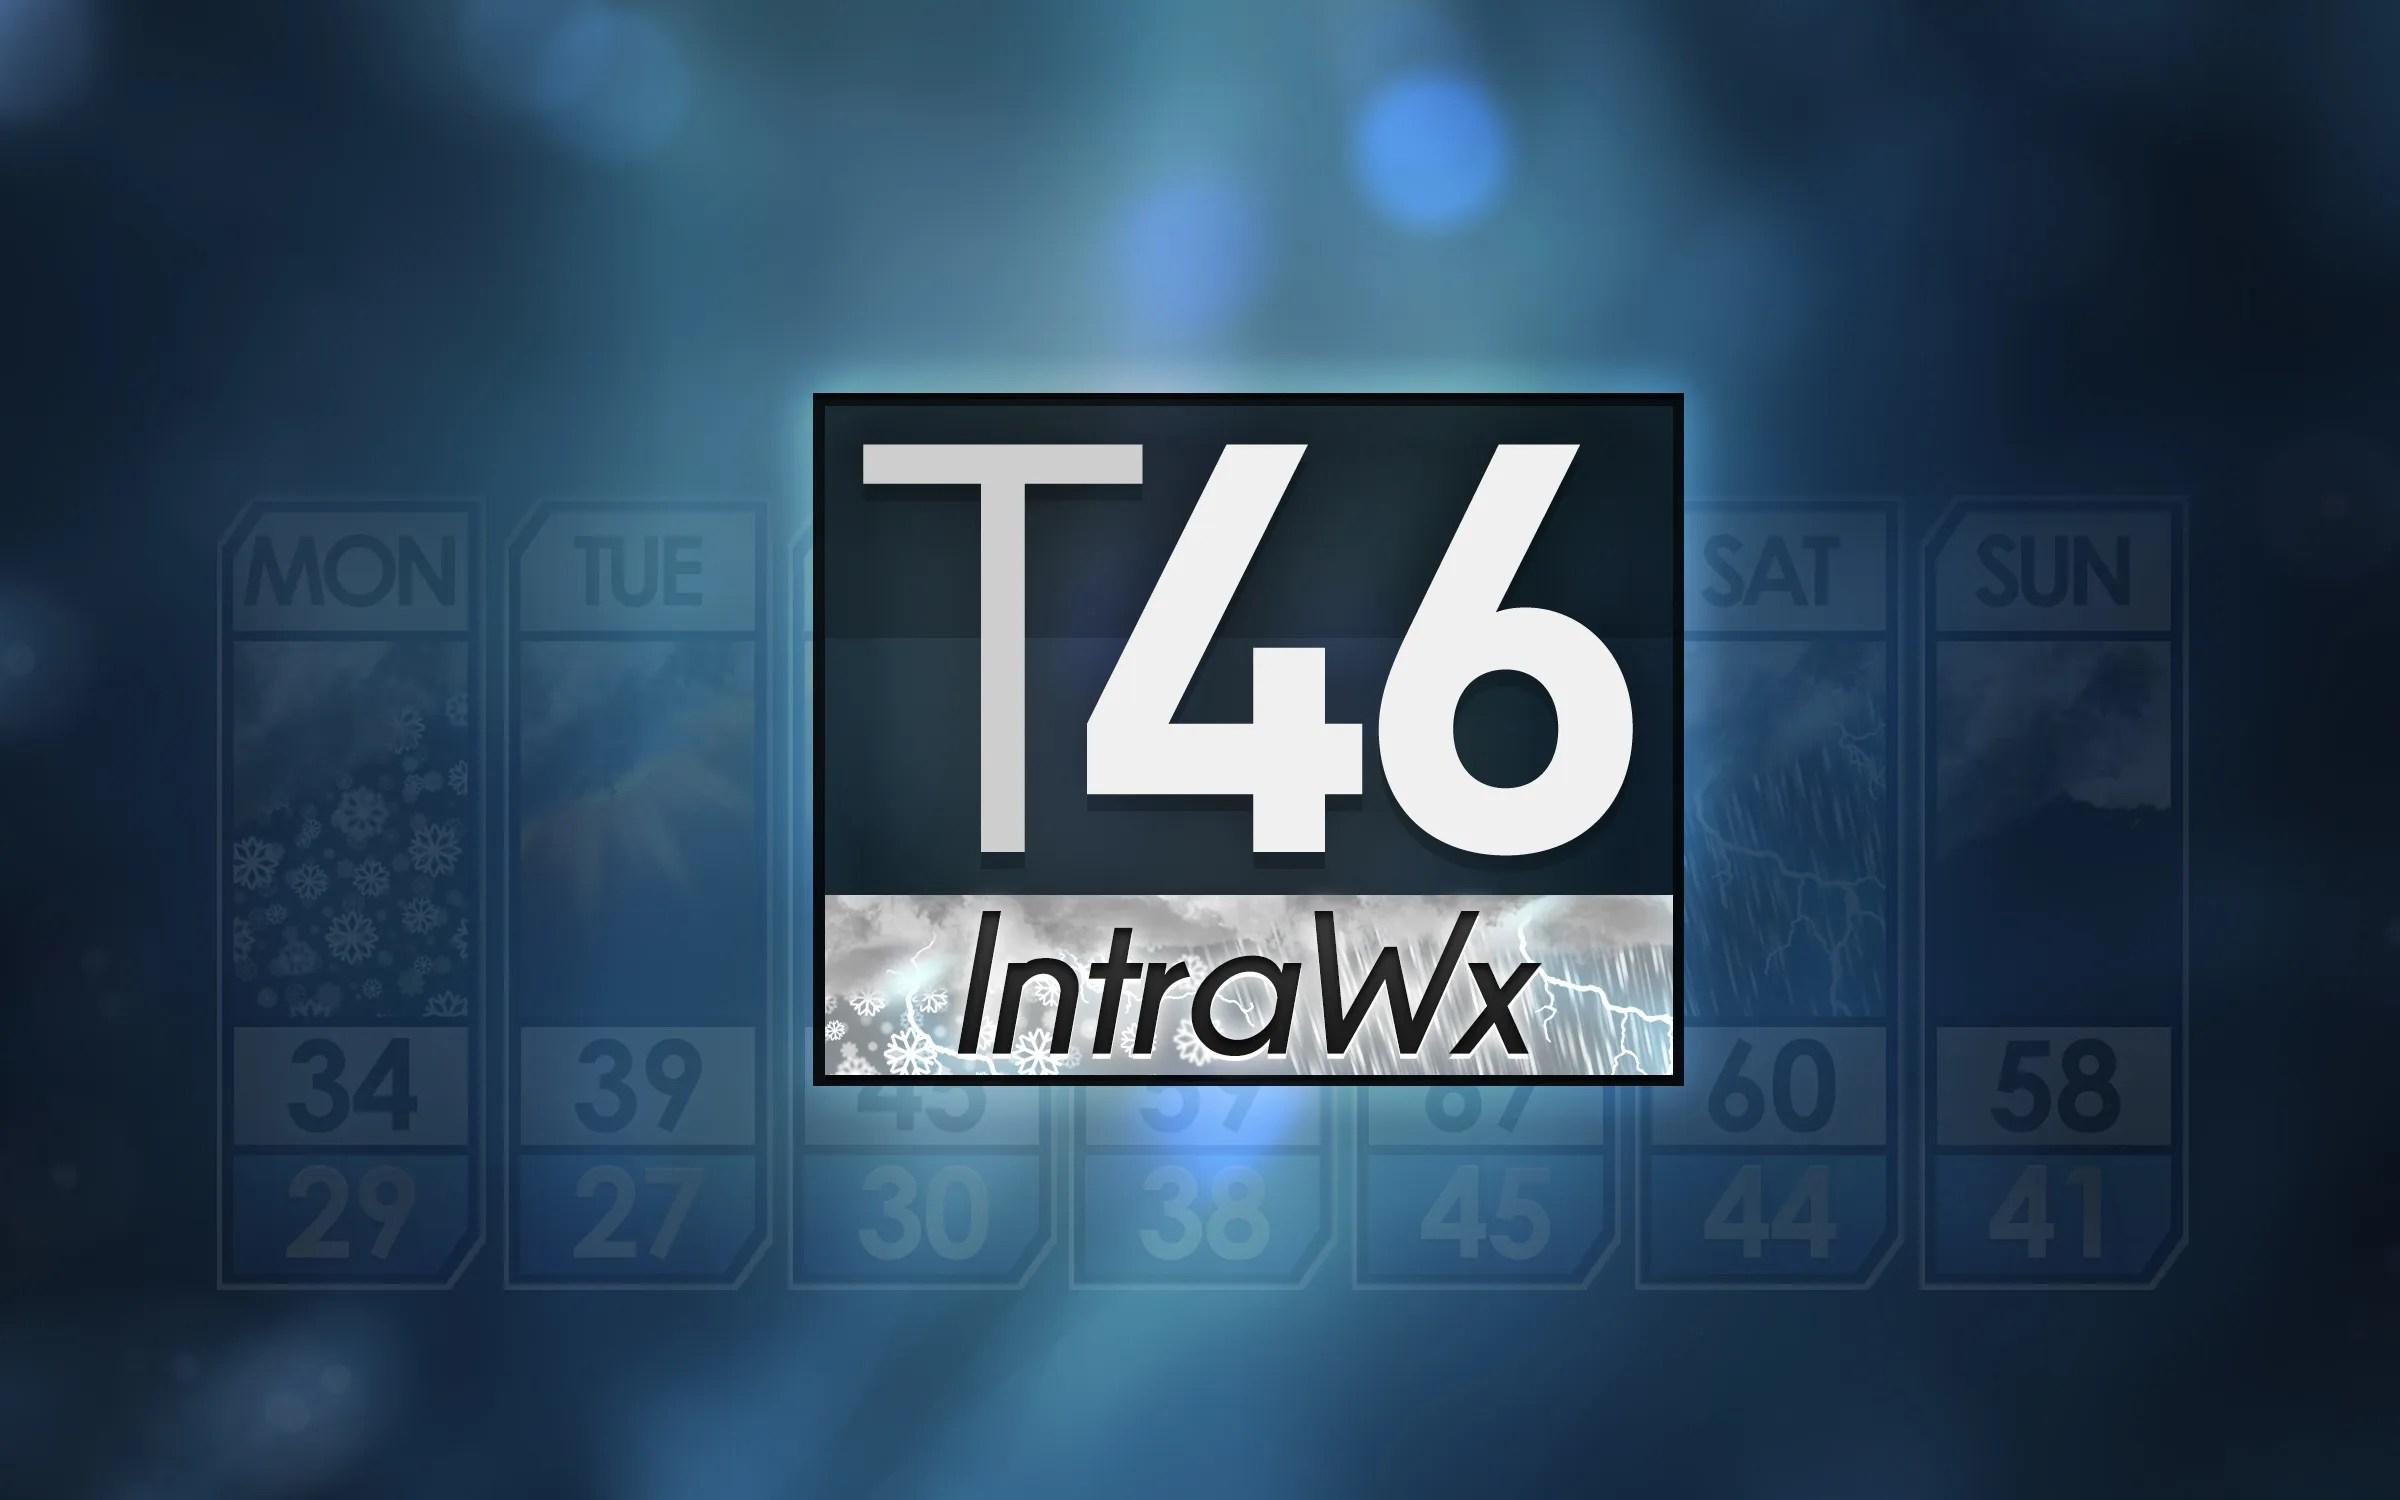 intrwx